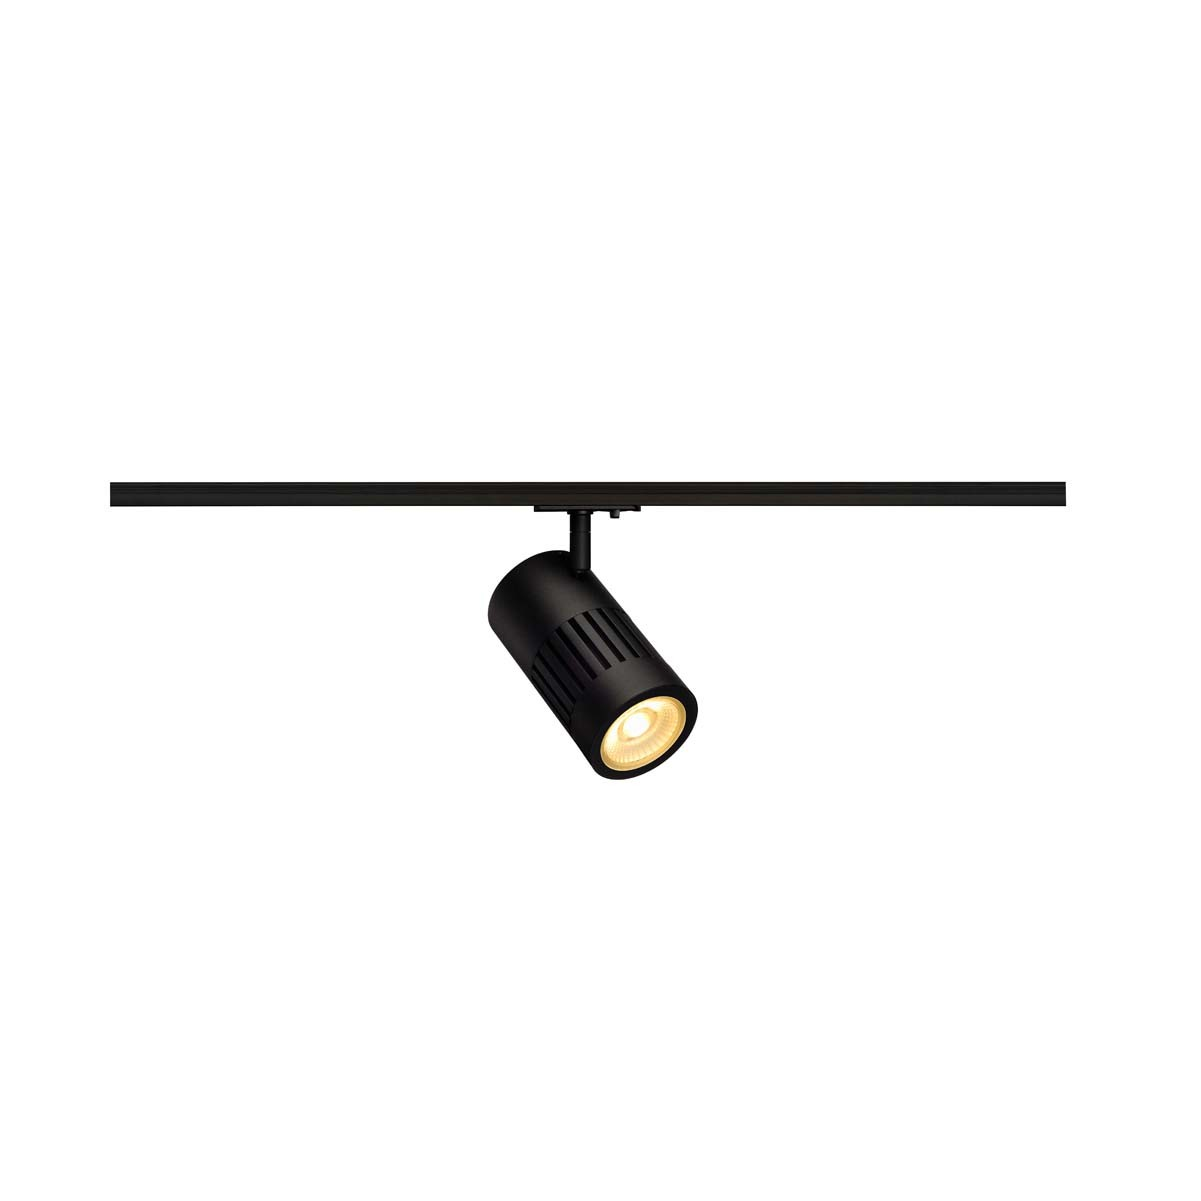 SLV 144110 STRUCTEC LED 24W, round, black, 3000K, 60°, incl. 1-phase adapter